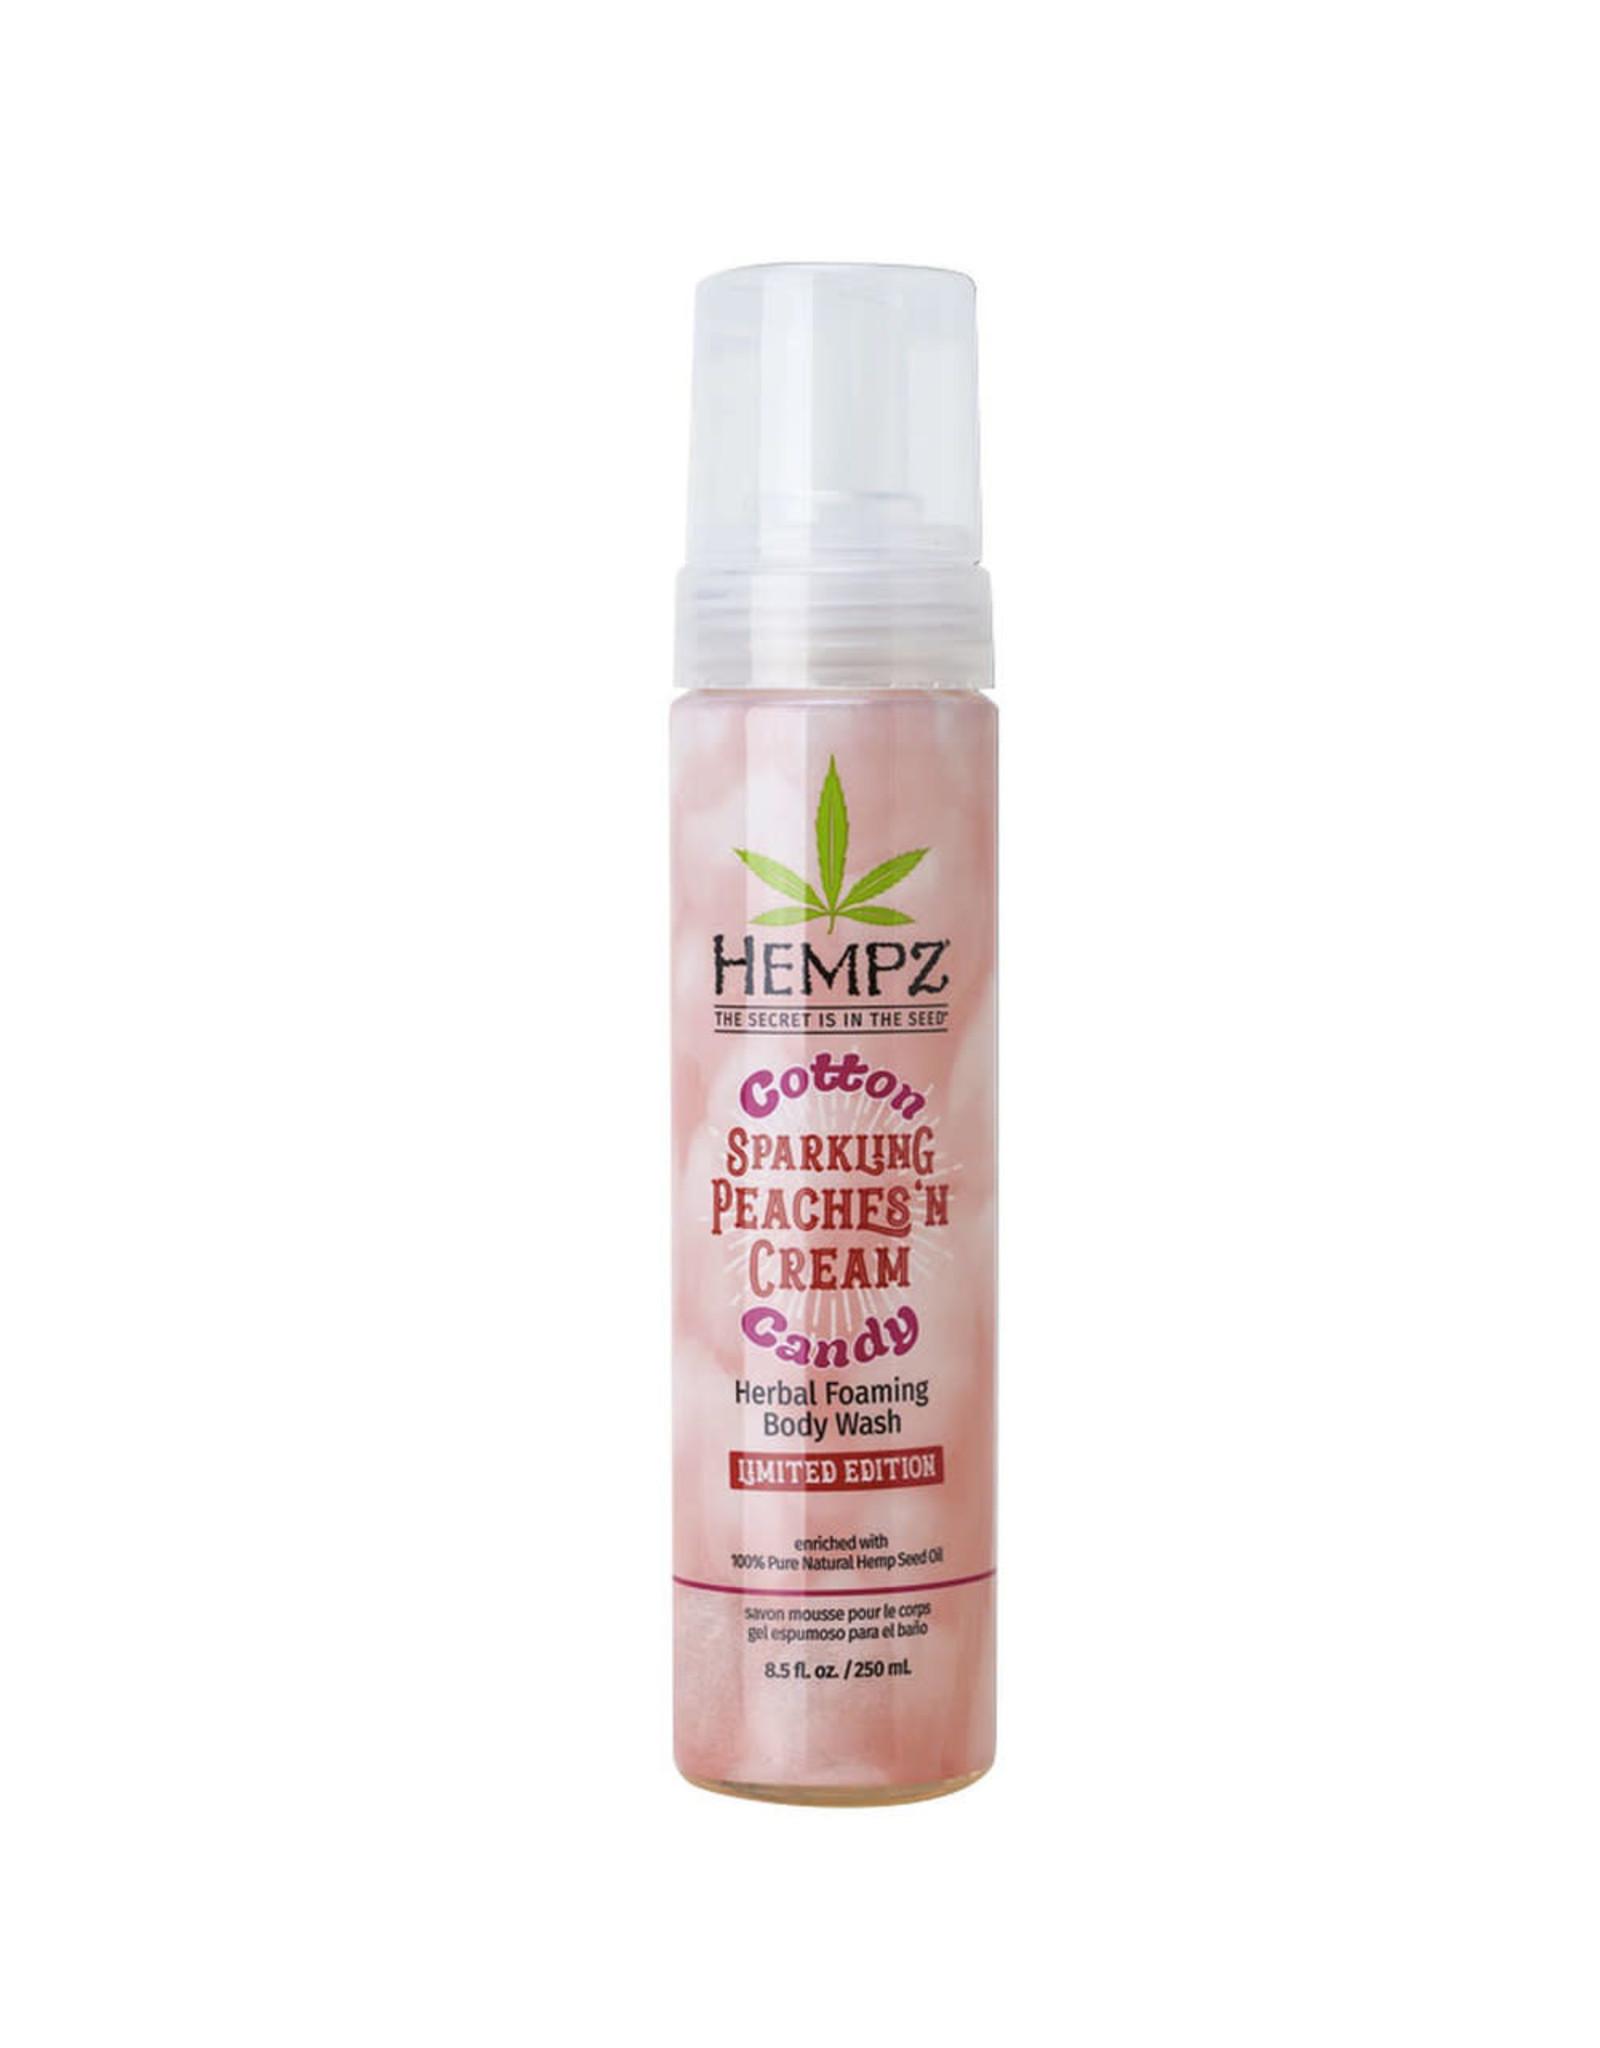 Hempz Foaming Herbal Body Wash 8.5oz Sparkling Peaches 'n Cream